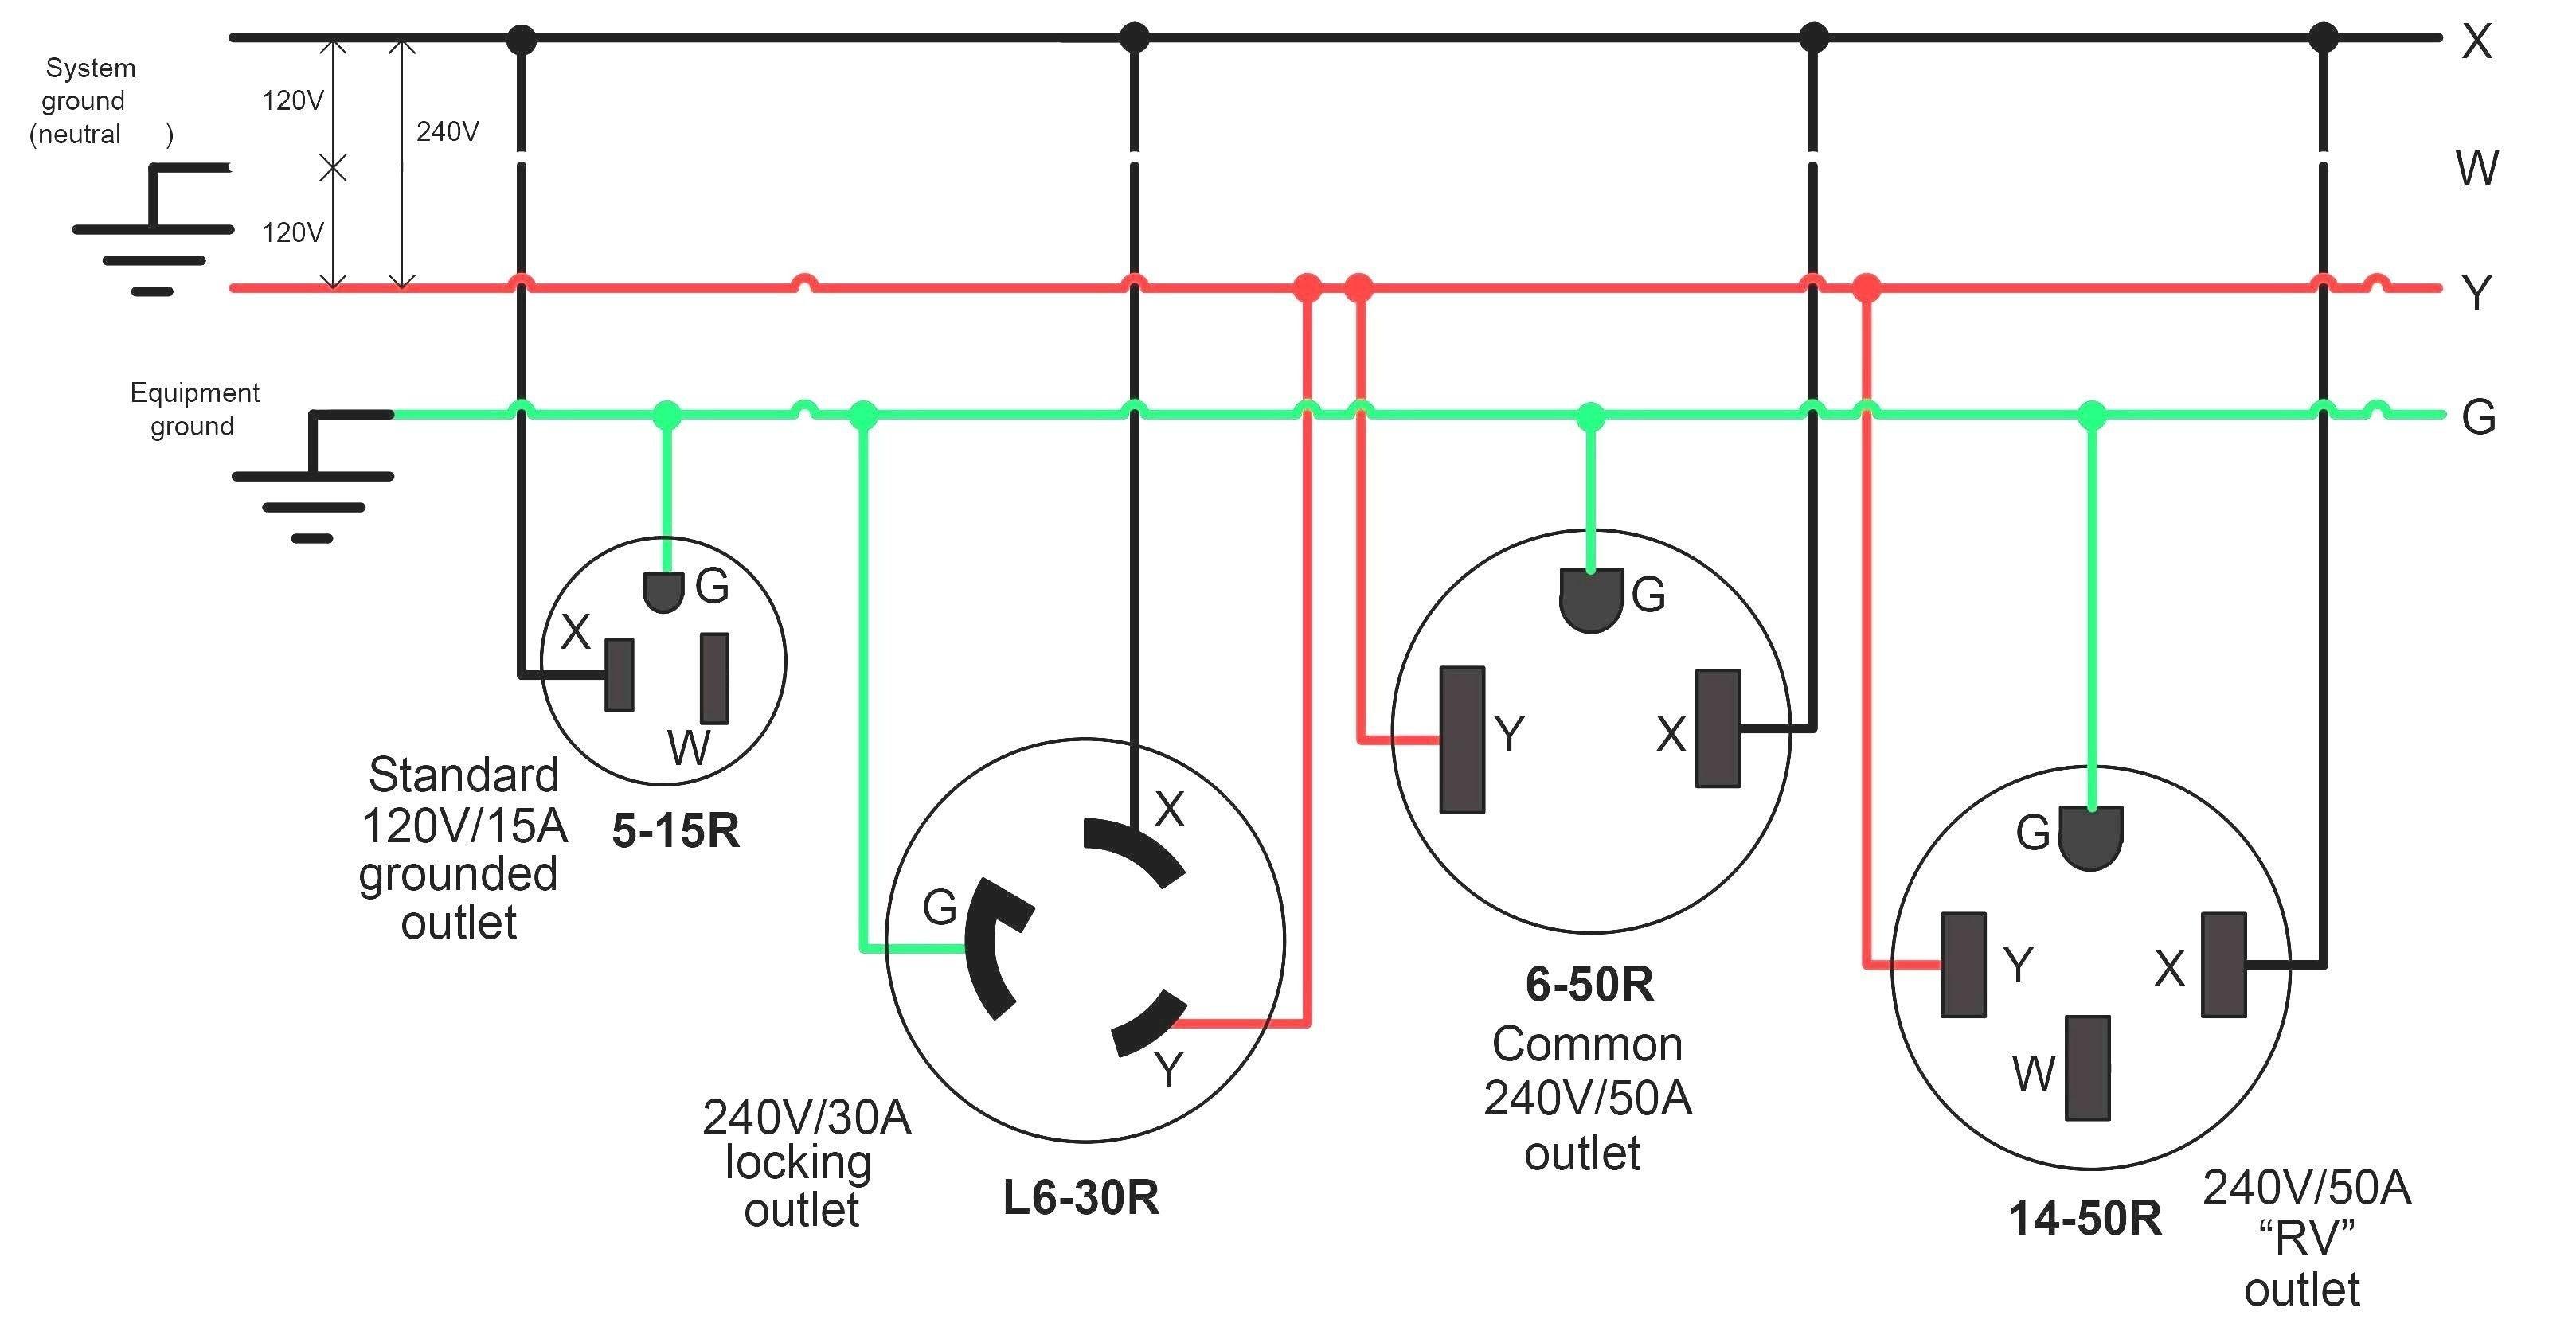 Elegant Wiring Diagram Nz Diagrams Digramssample Diagramimages Wiringdiagramsample Wiringdiagram C Outlet Wiring Electrical Plug Wiring Electrical Outlets